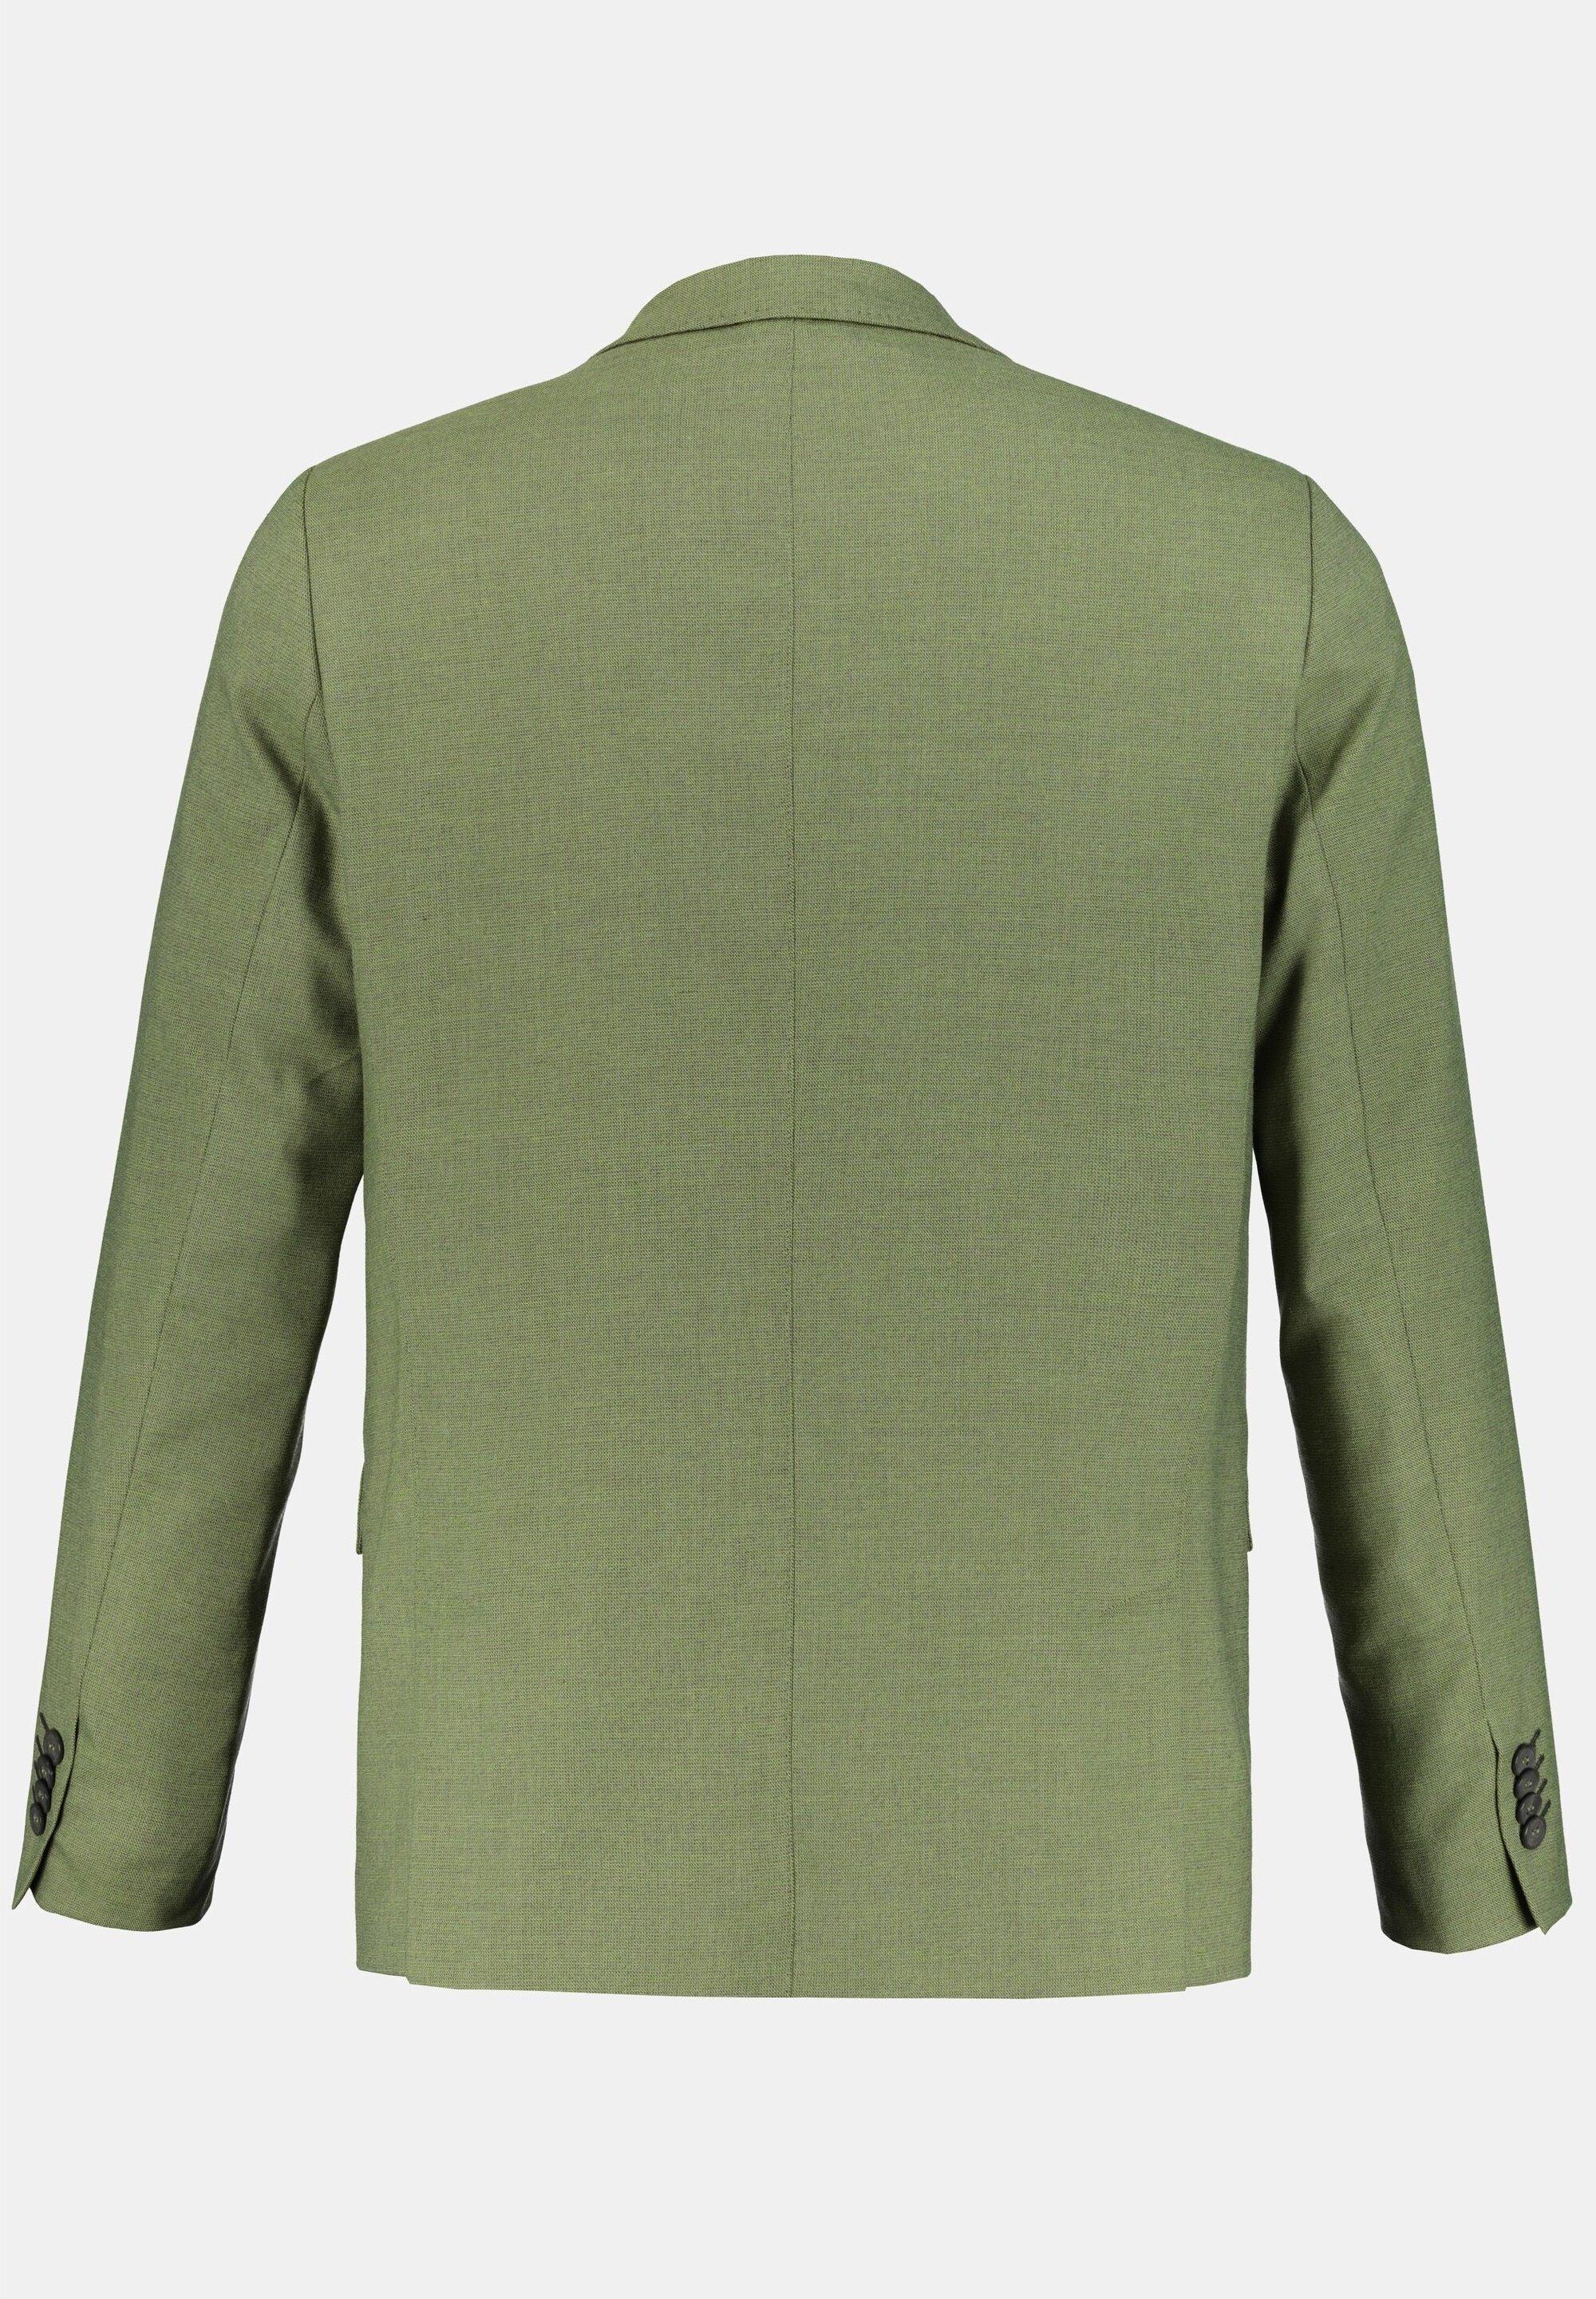 JP1880 GROSSE GRÖSSEN, BAMBUS - Blazer - waldgrün